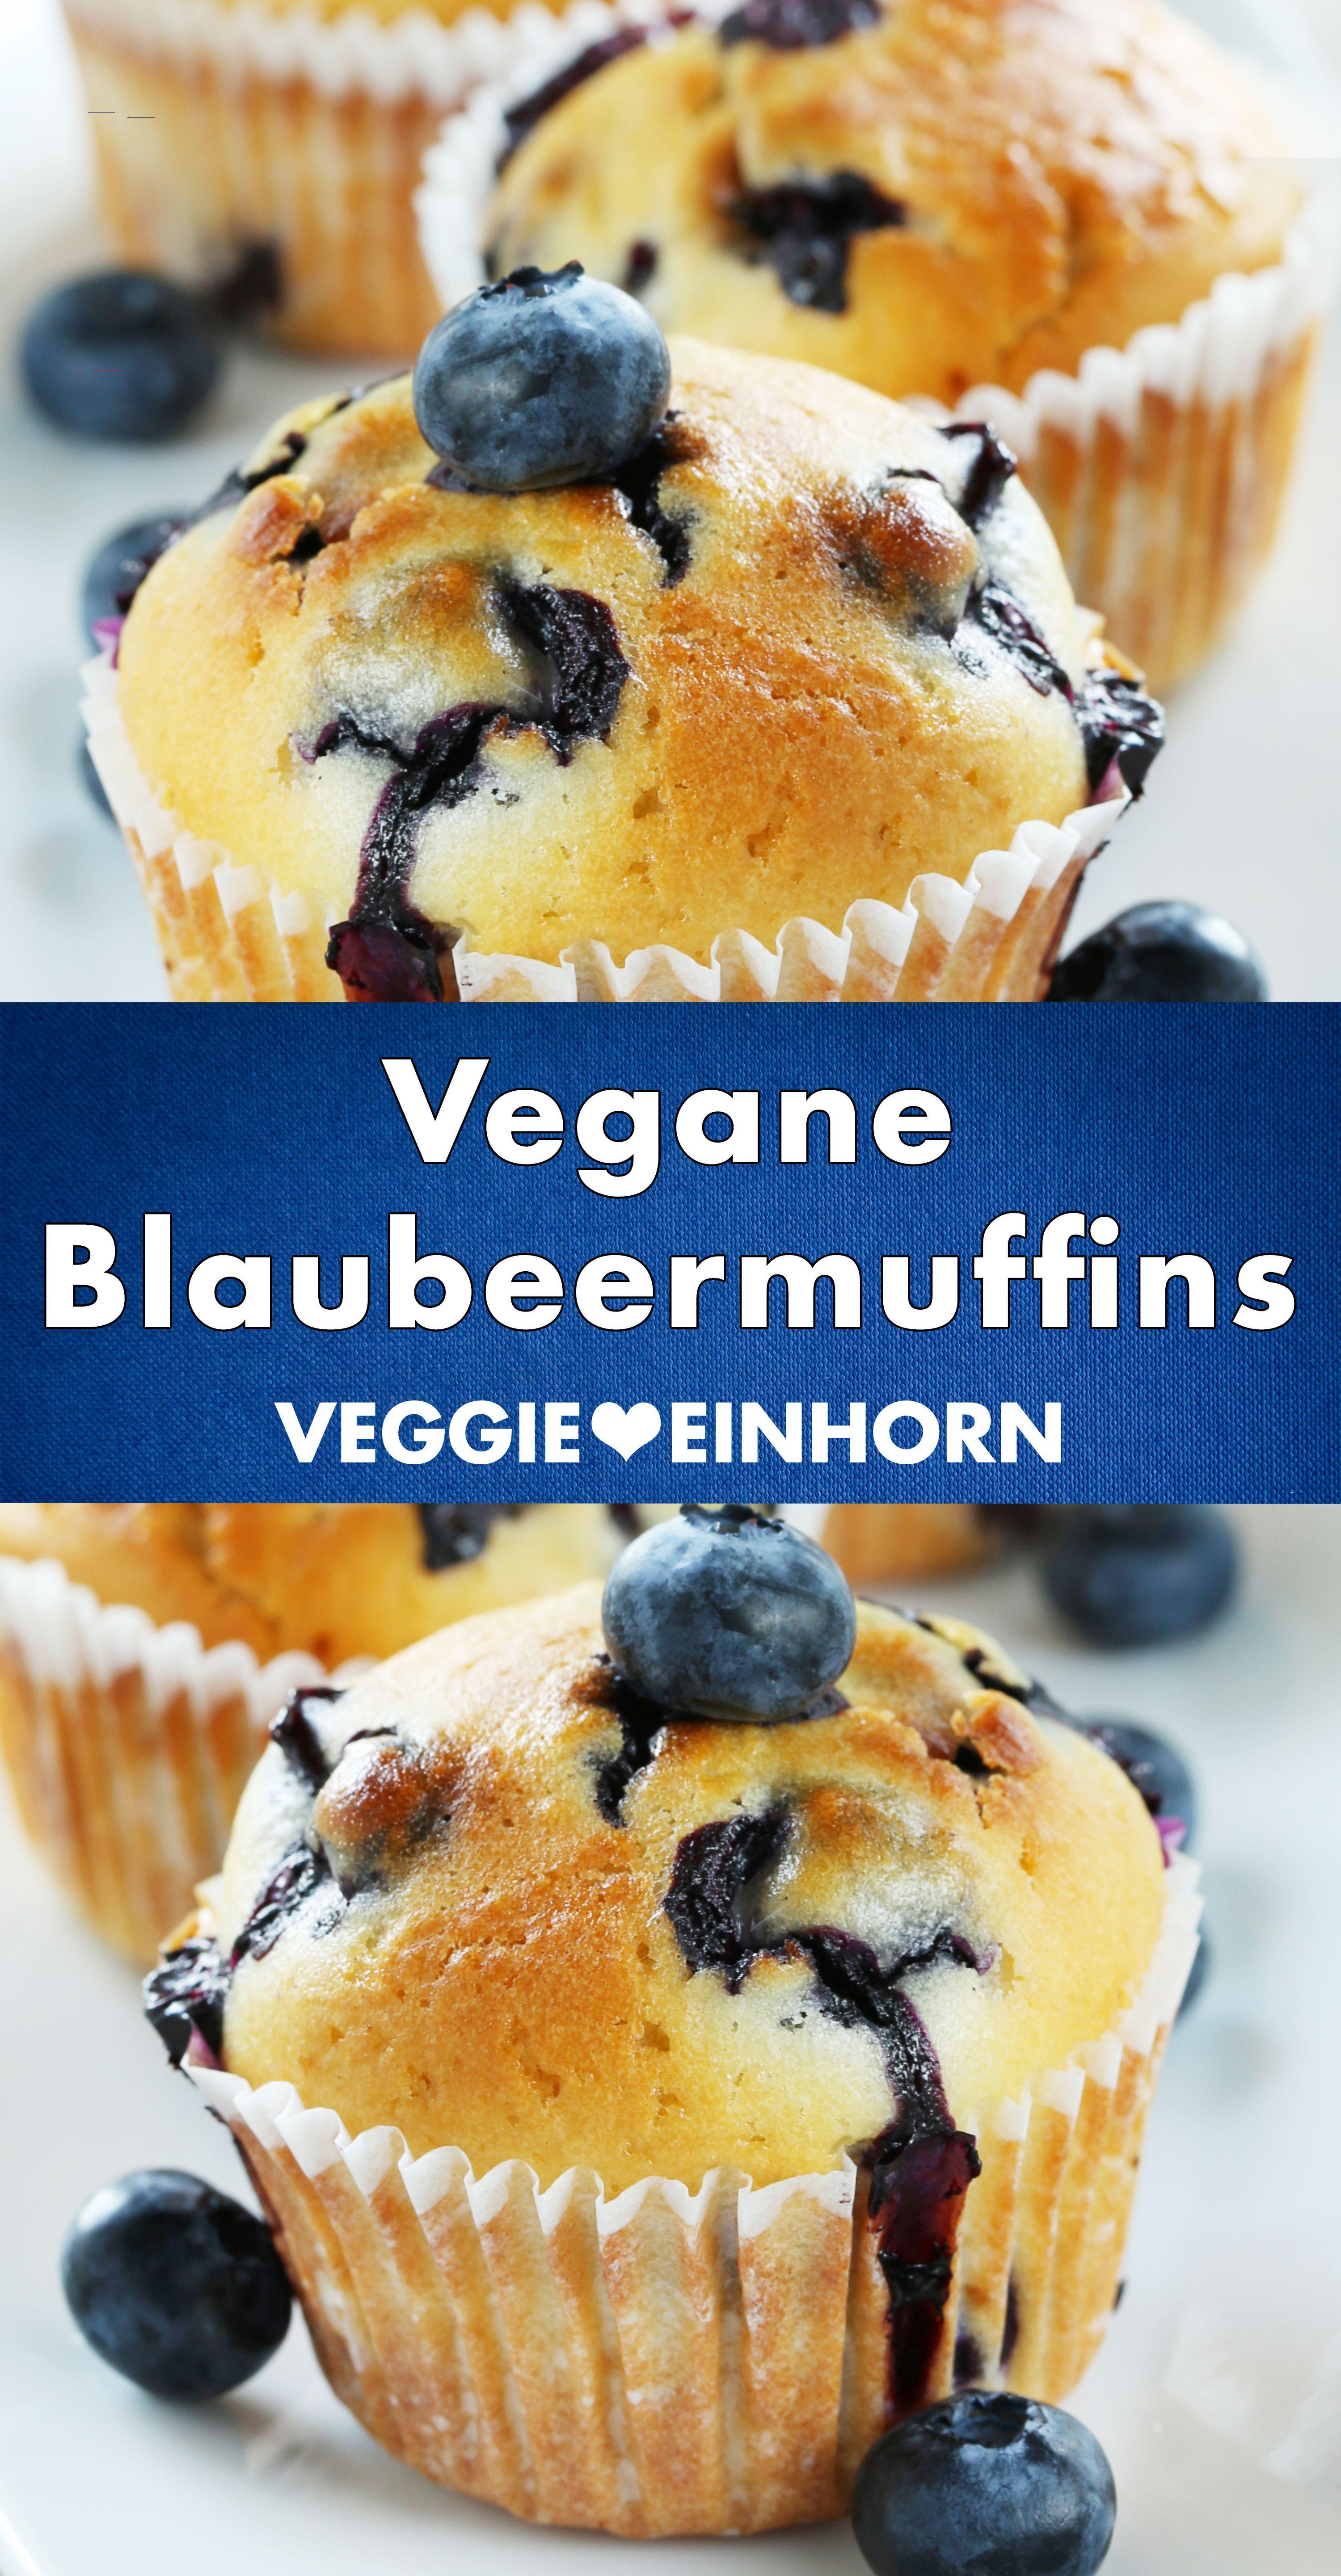 7c42b4dcd4172b88c4da37bc7b8a252c - Blaubeer Muffins Rezepte